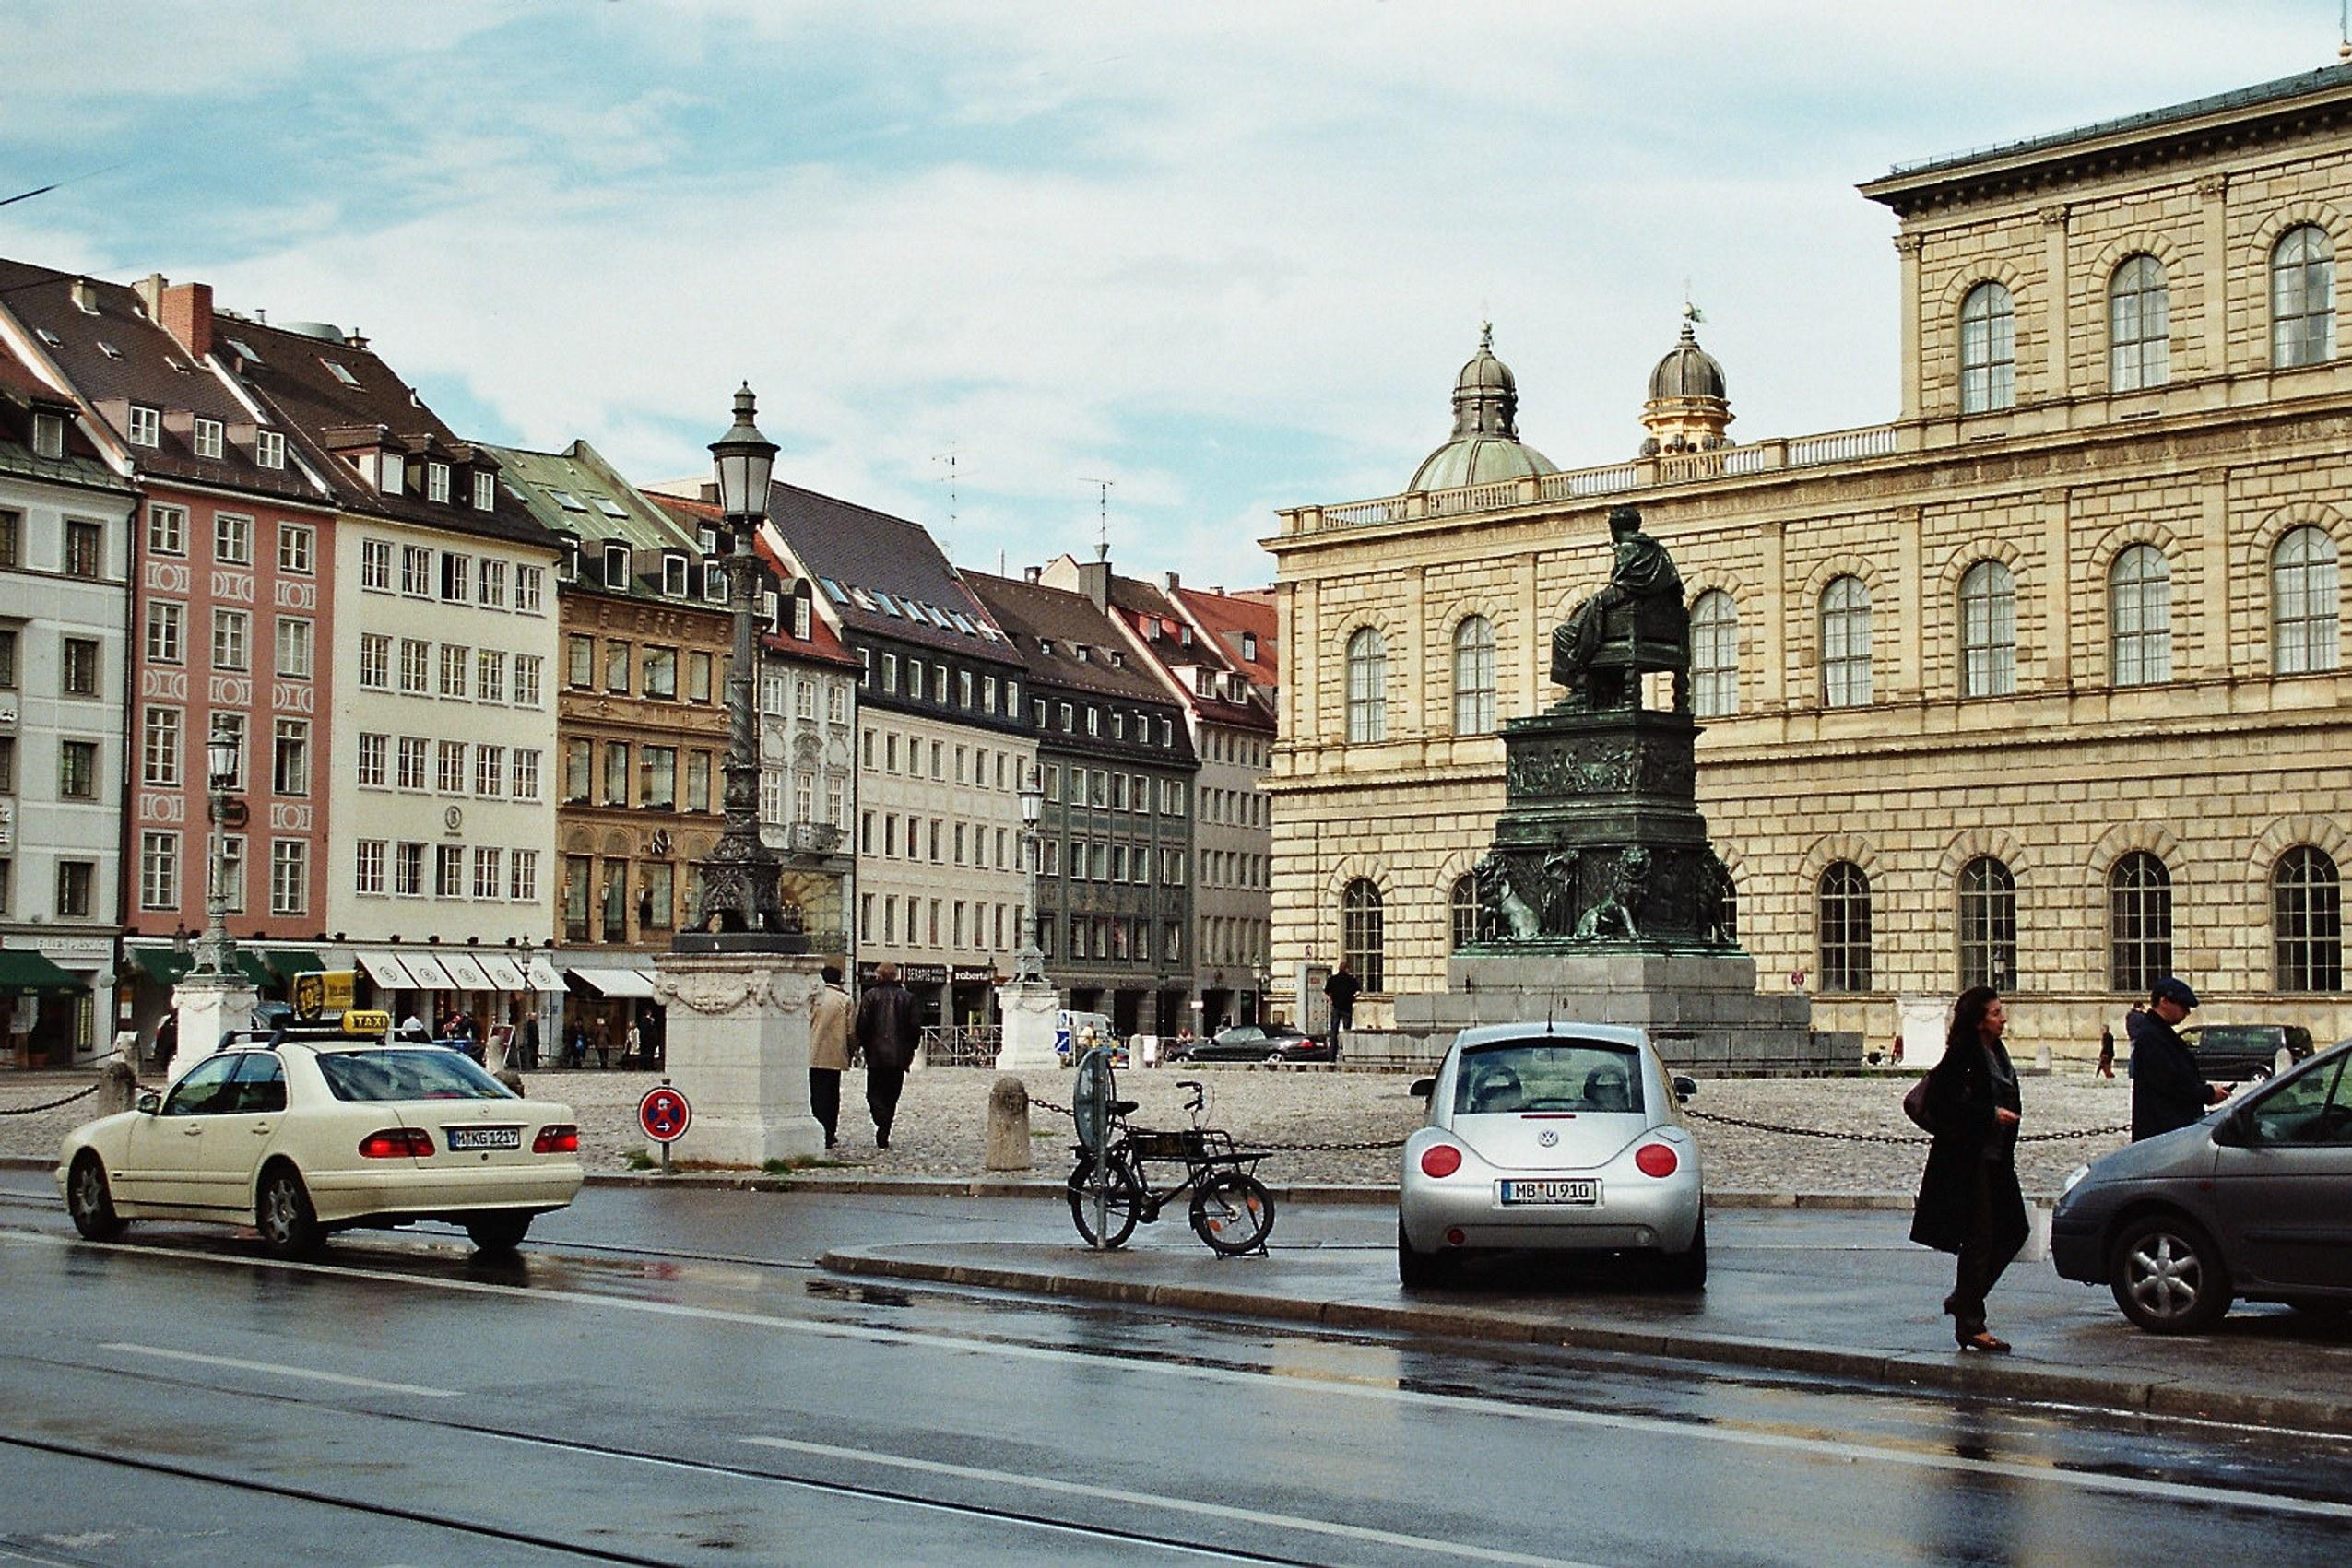 St Platz München file münchen der max joseph platz jpg wikimedia commons